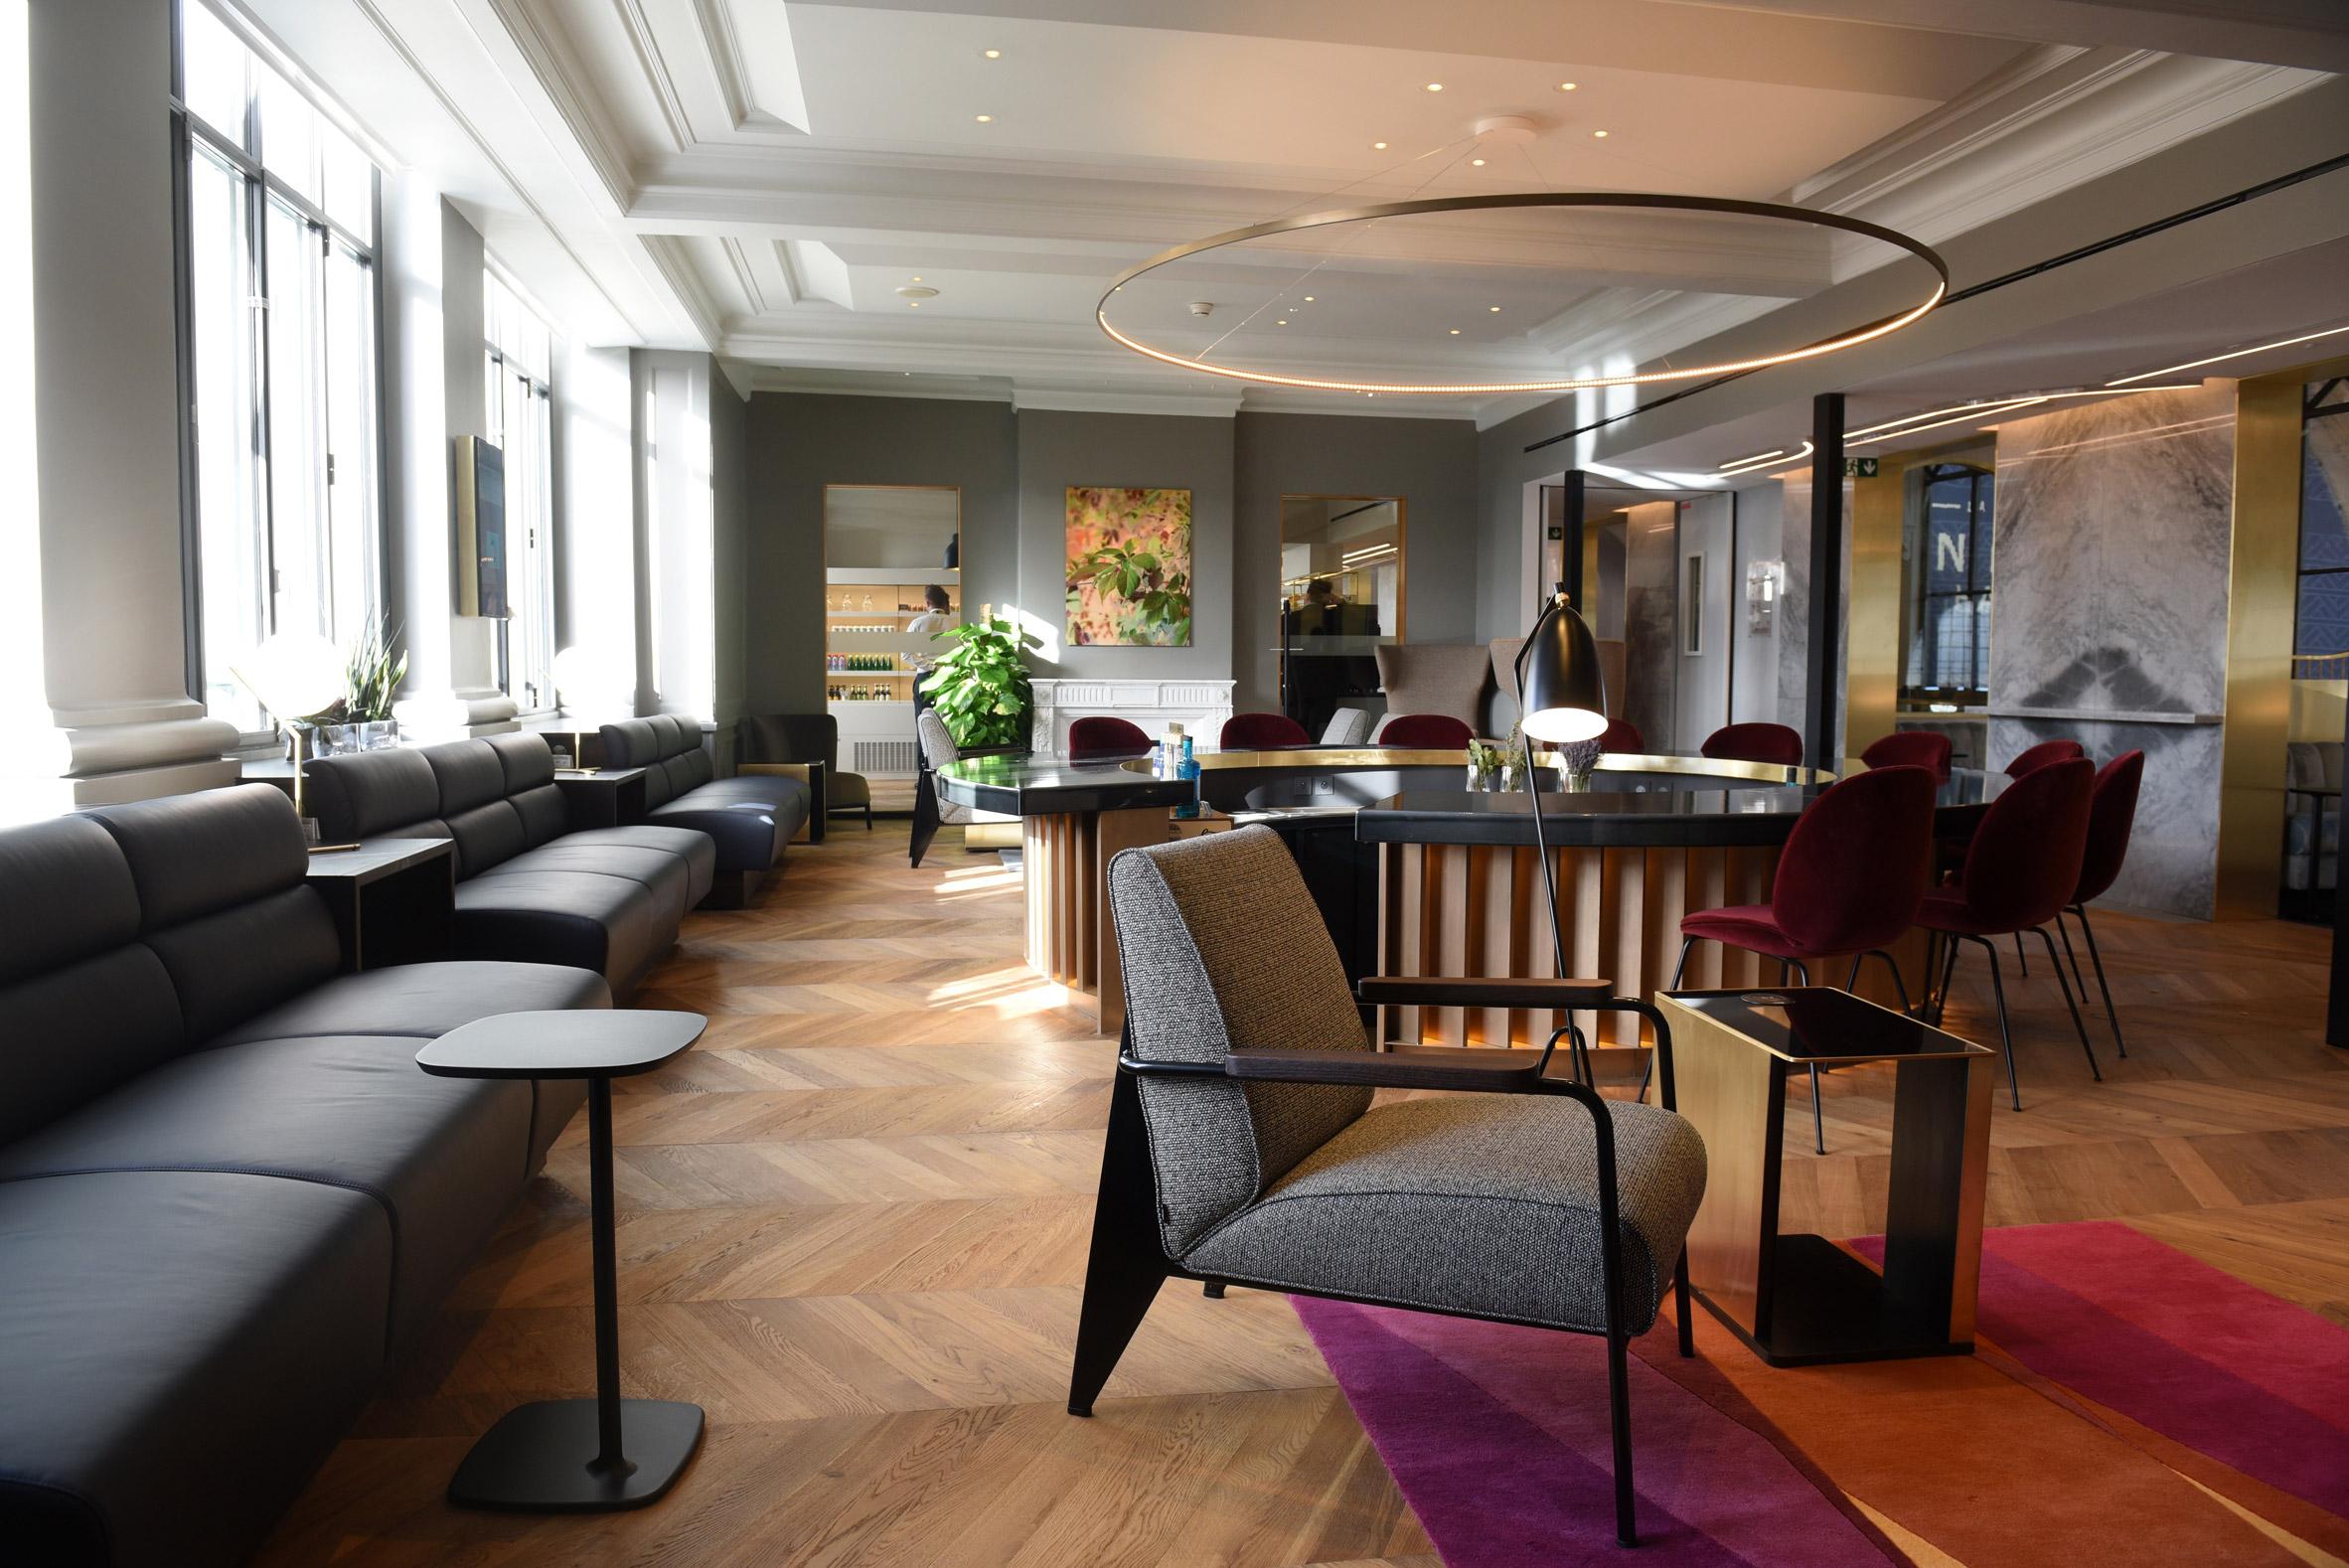 eurostar lounge in paris London Studio Softroom designs luxurious Eurostar Lounge in Paris London Studio Softroom designs luxurious Eurostar Lounge in Paris 3